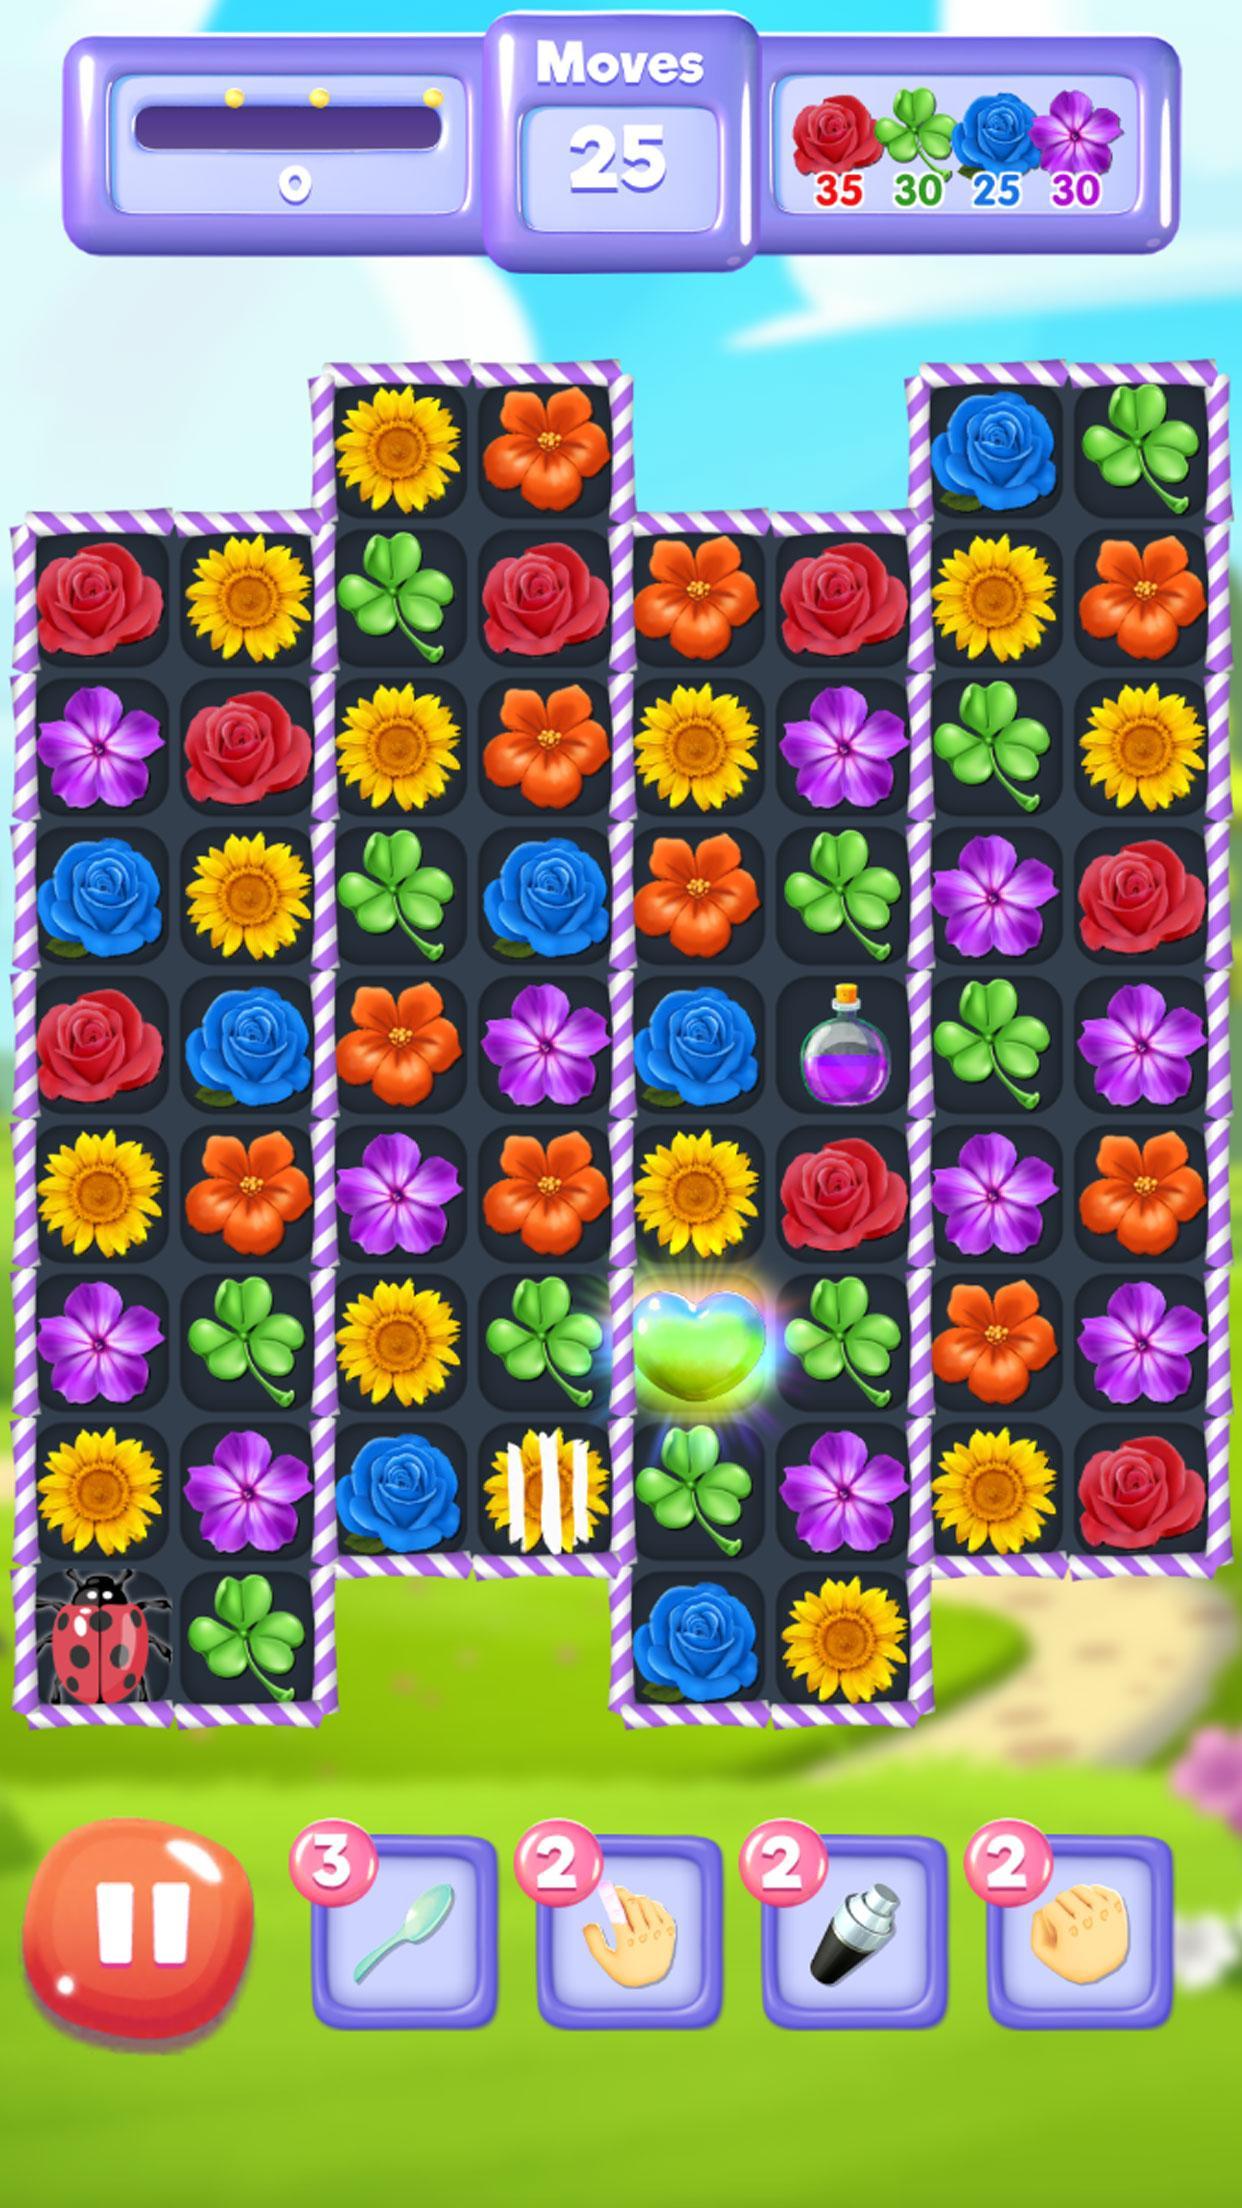 Blossom Bloom Flower Blast Match 3 Games 1.9 Screenshot 4